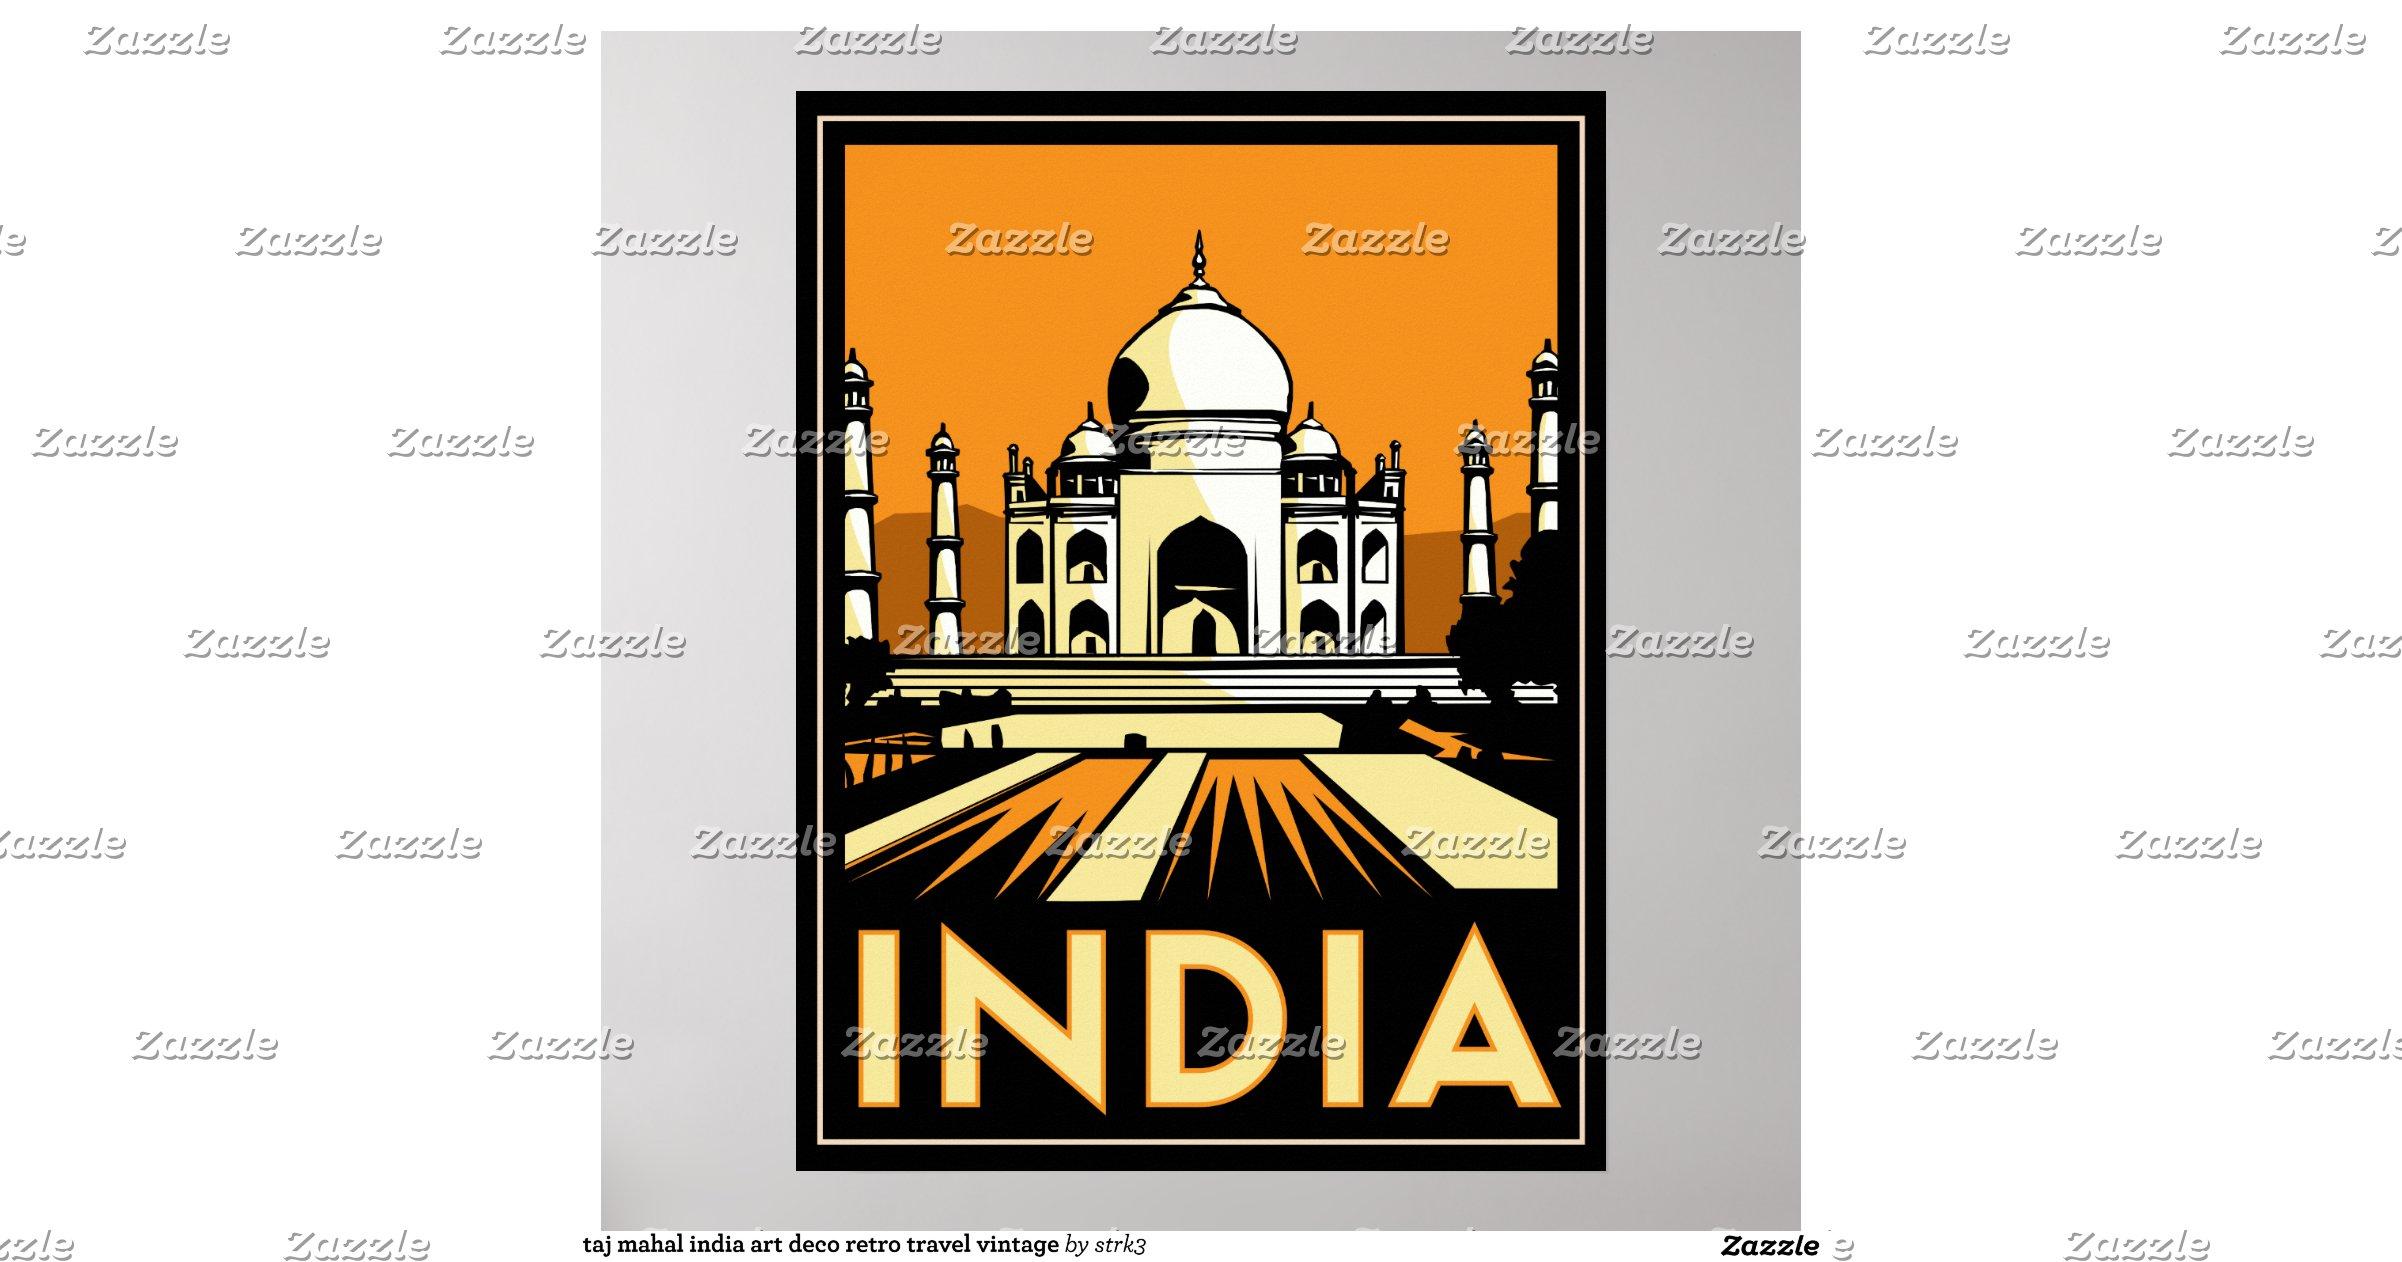 Taj mahal india art deco retro travel vintage poster for Classic art deco